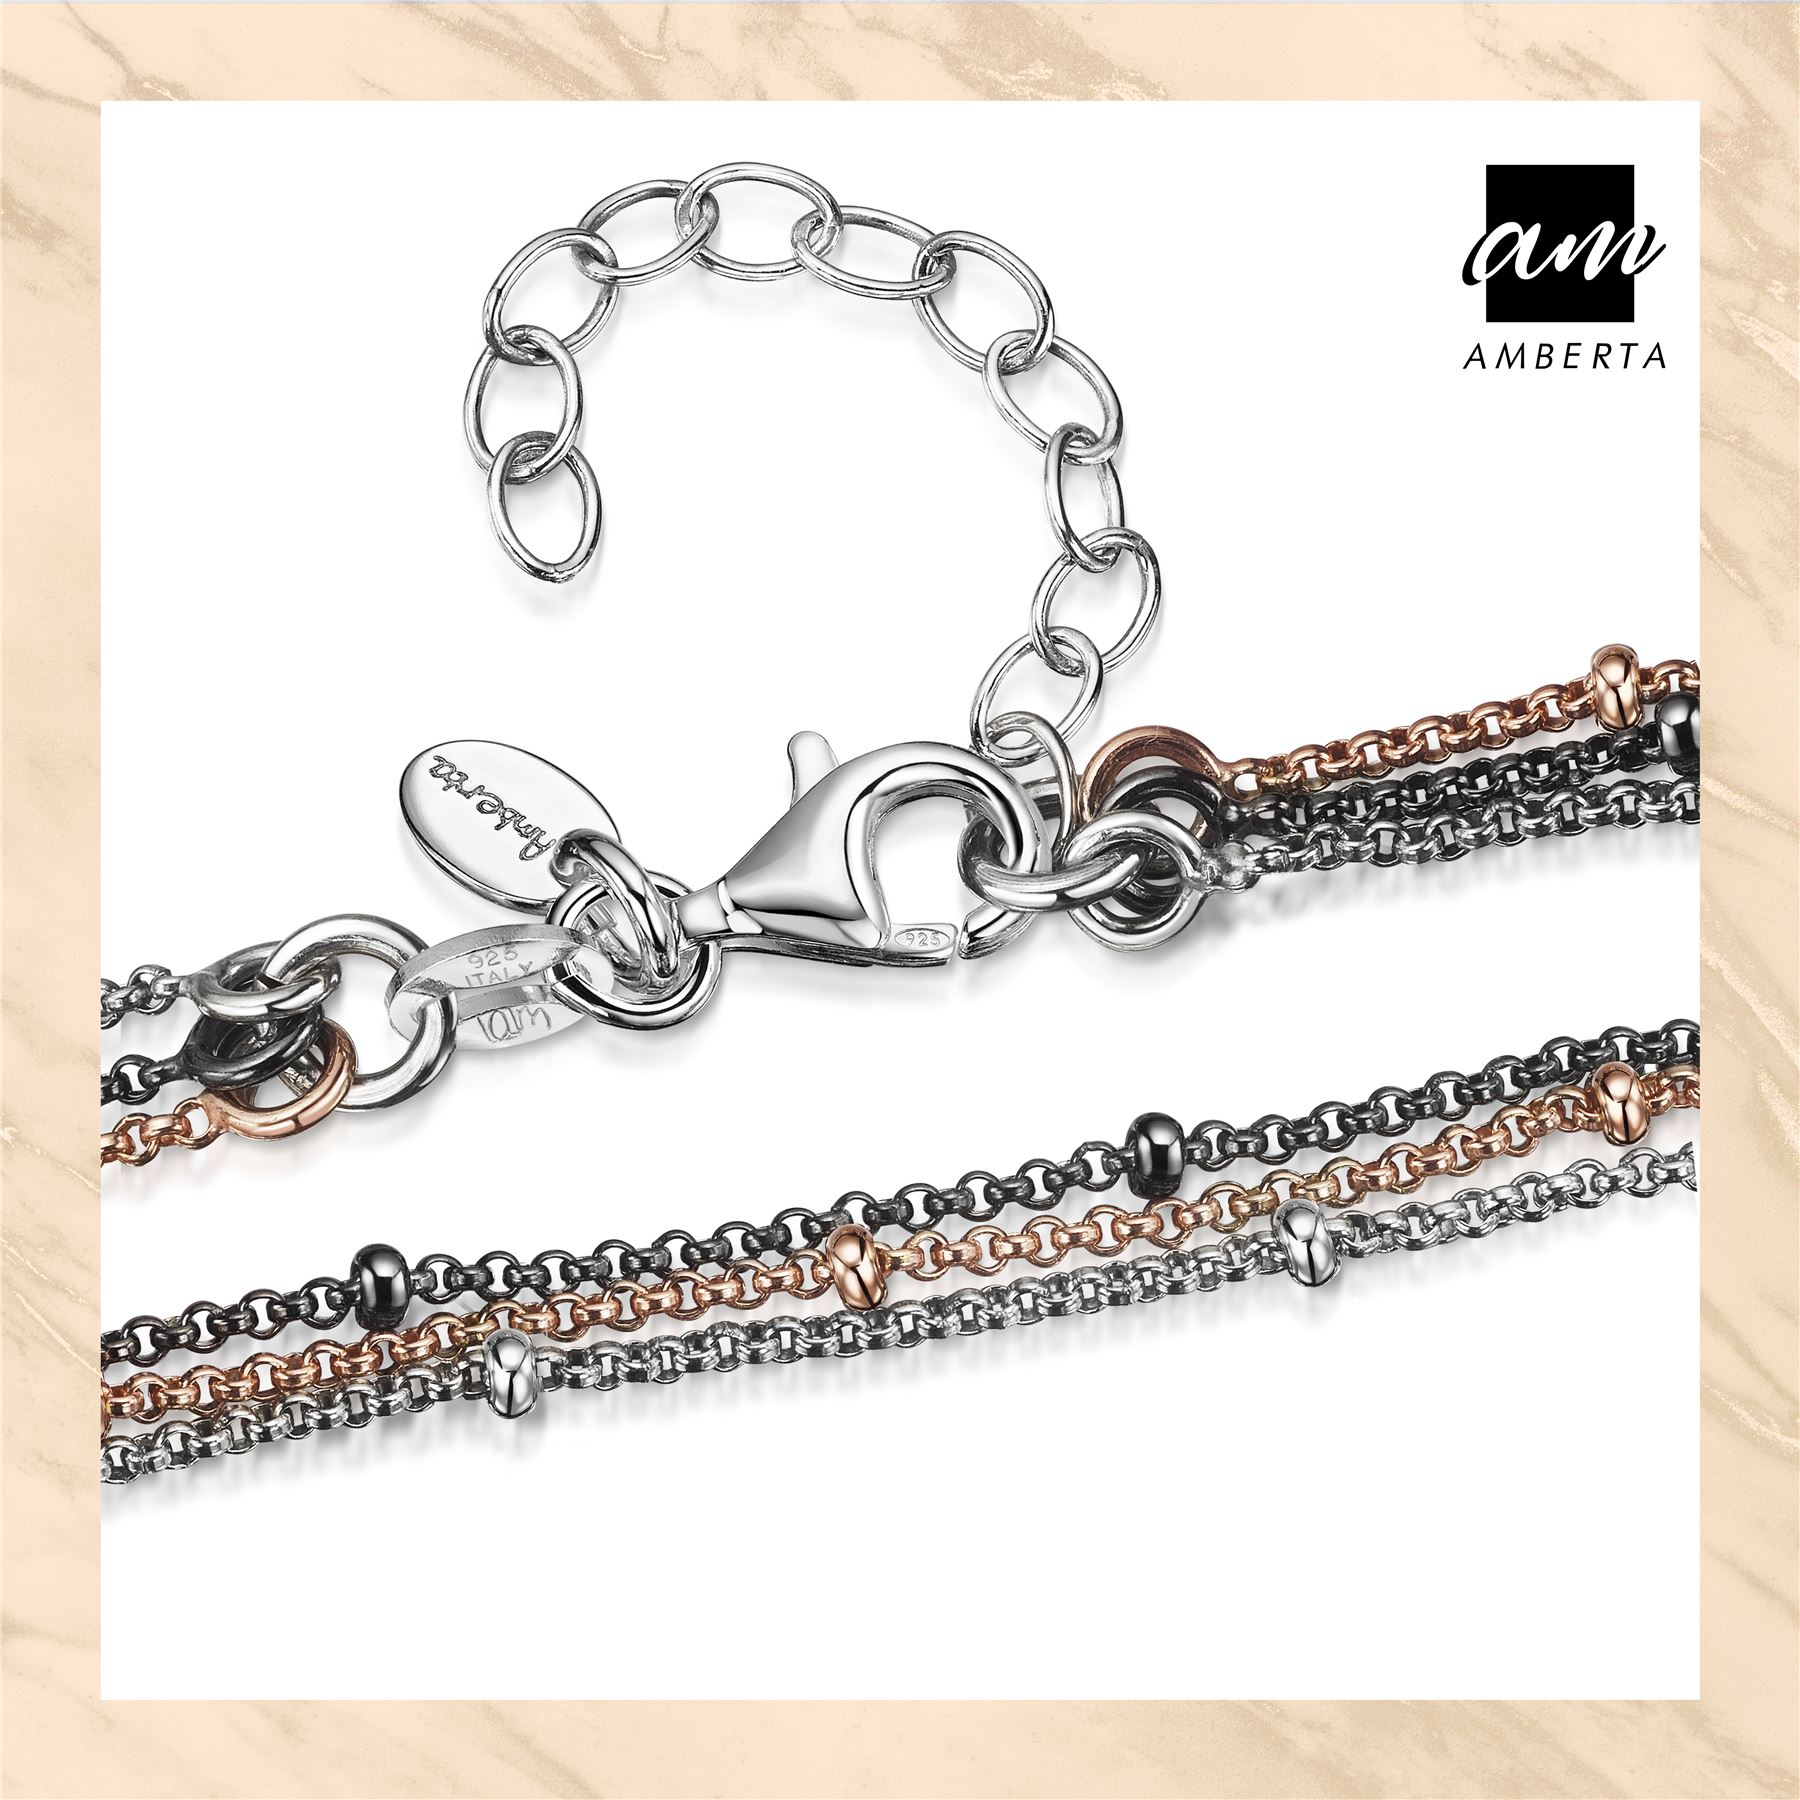 Amberta-925-Sterling-Silver-Adjustable-Multi-Layered-Chain-Bracelet-for-Women miniature 14